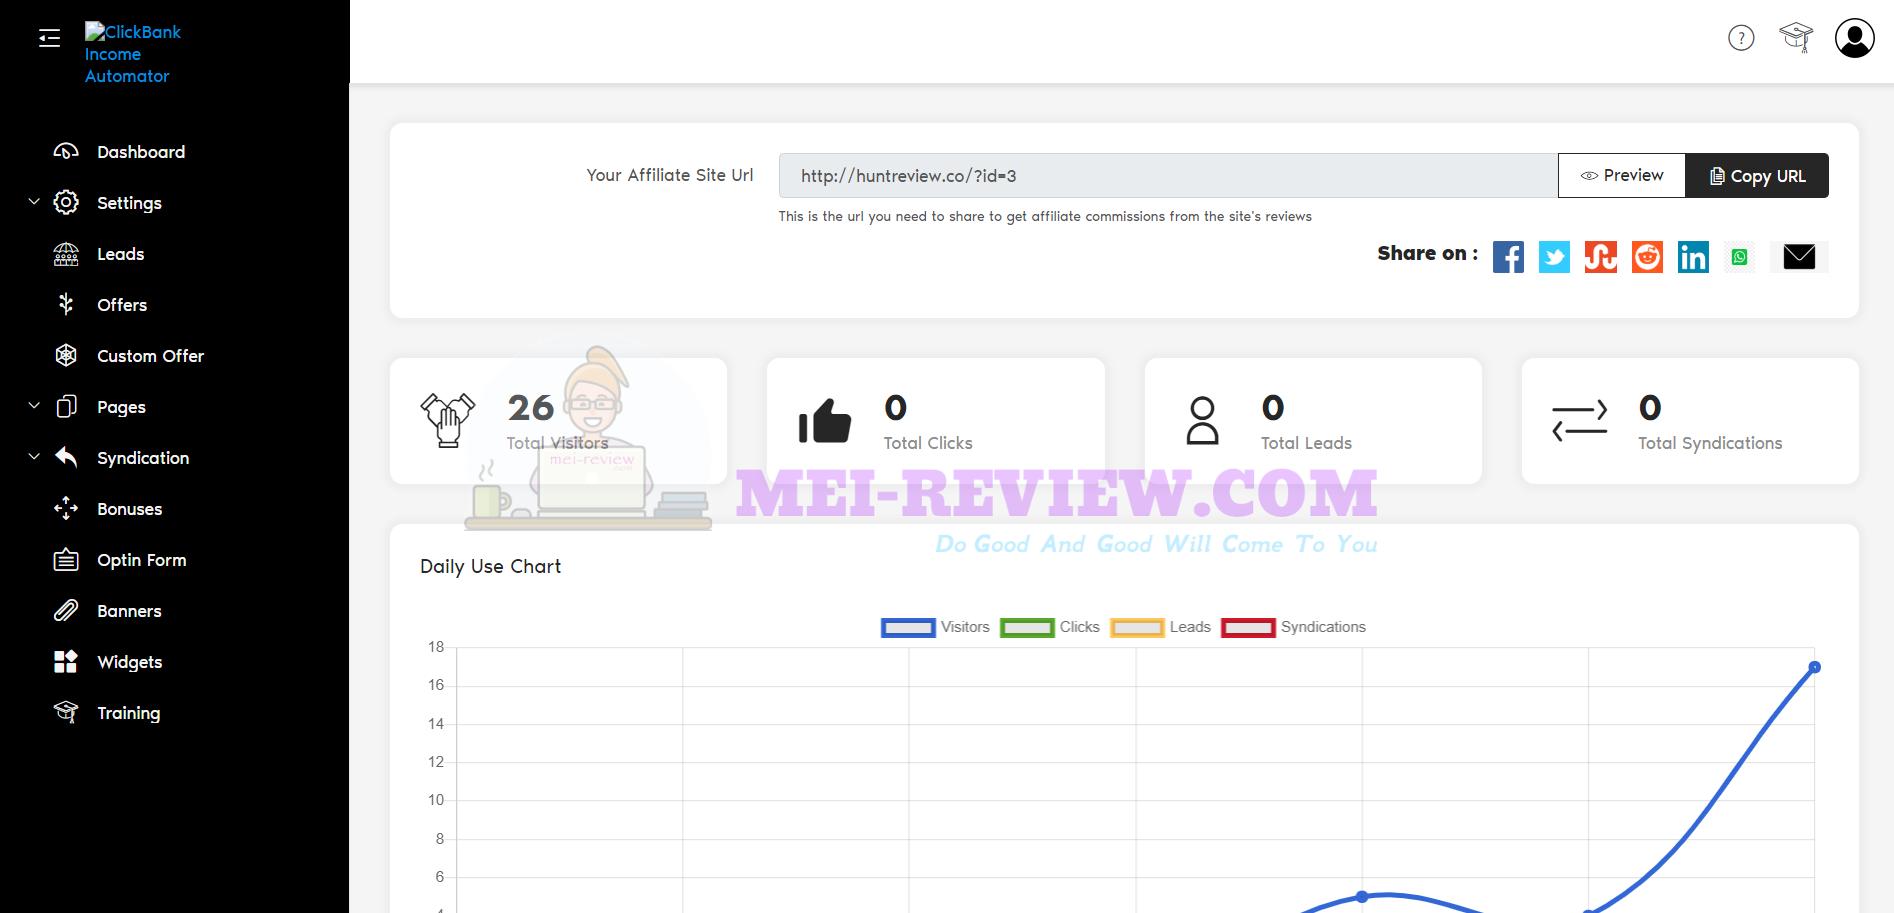 Clickbank-income-automator-step-1-dashboard